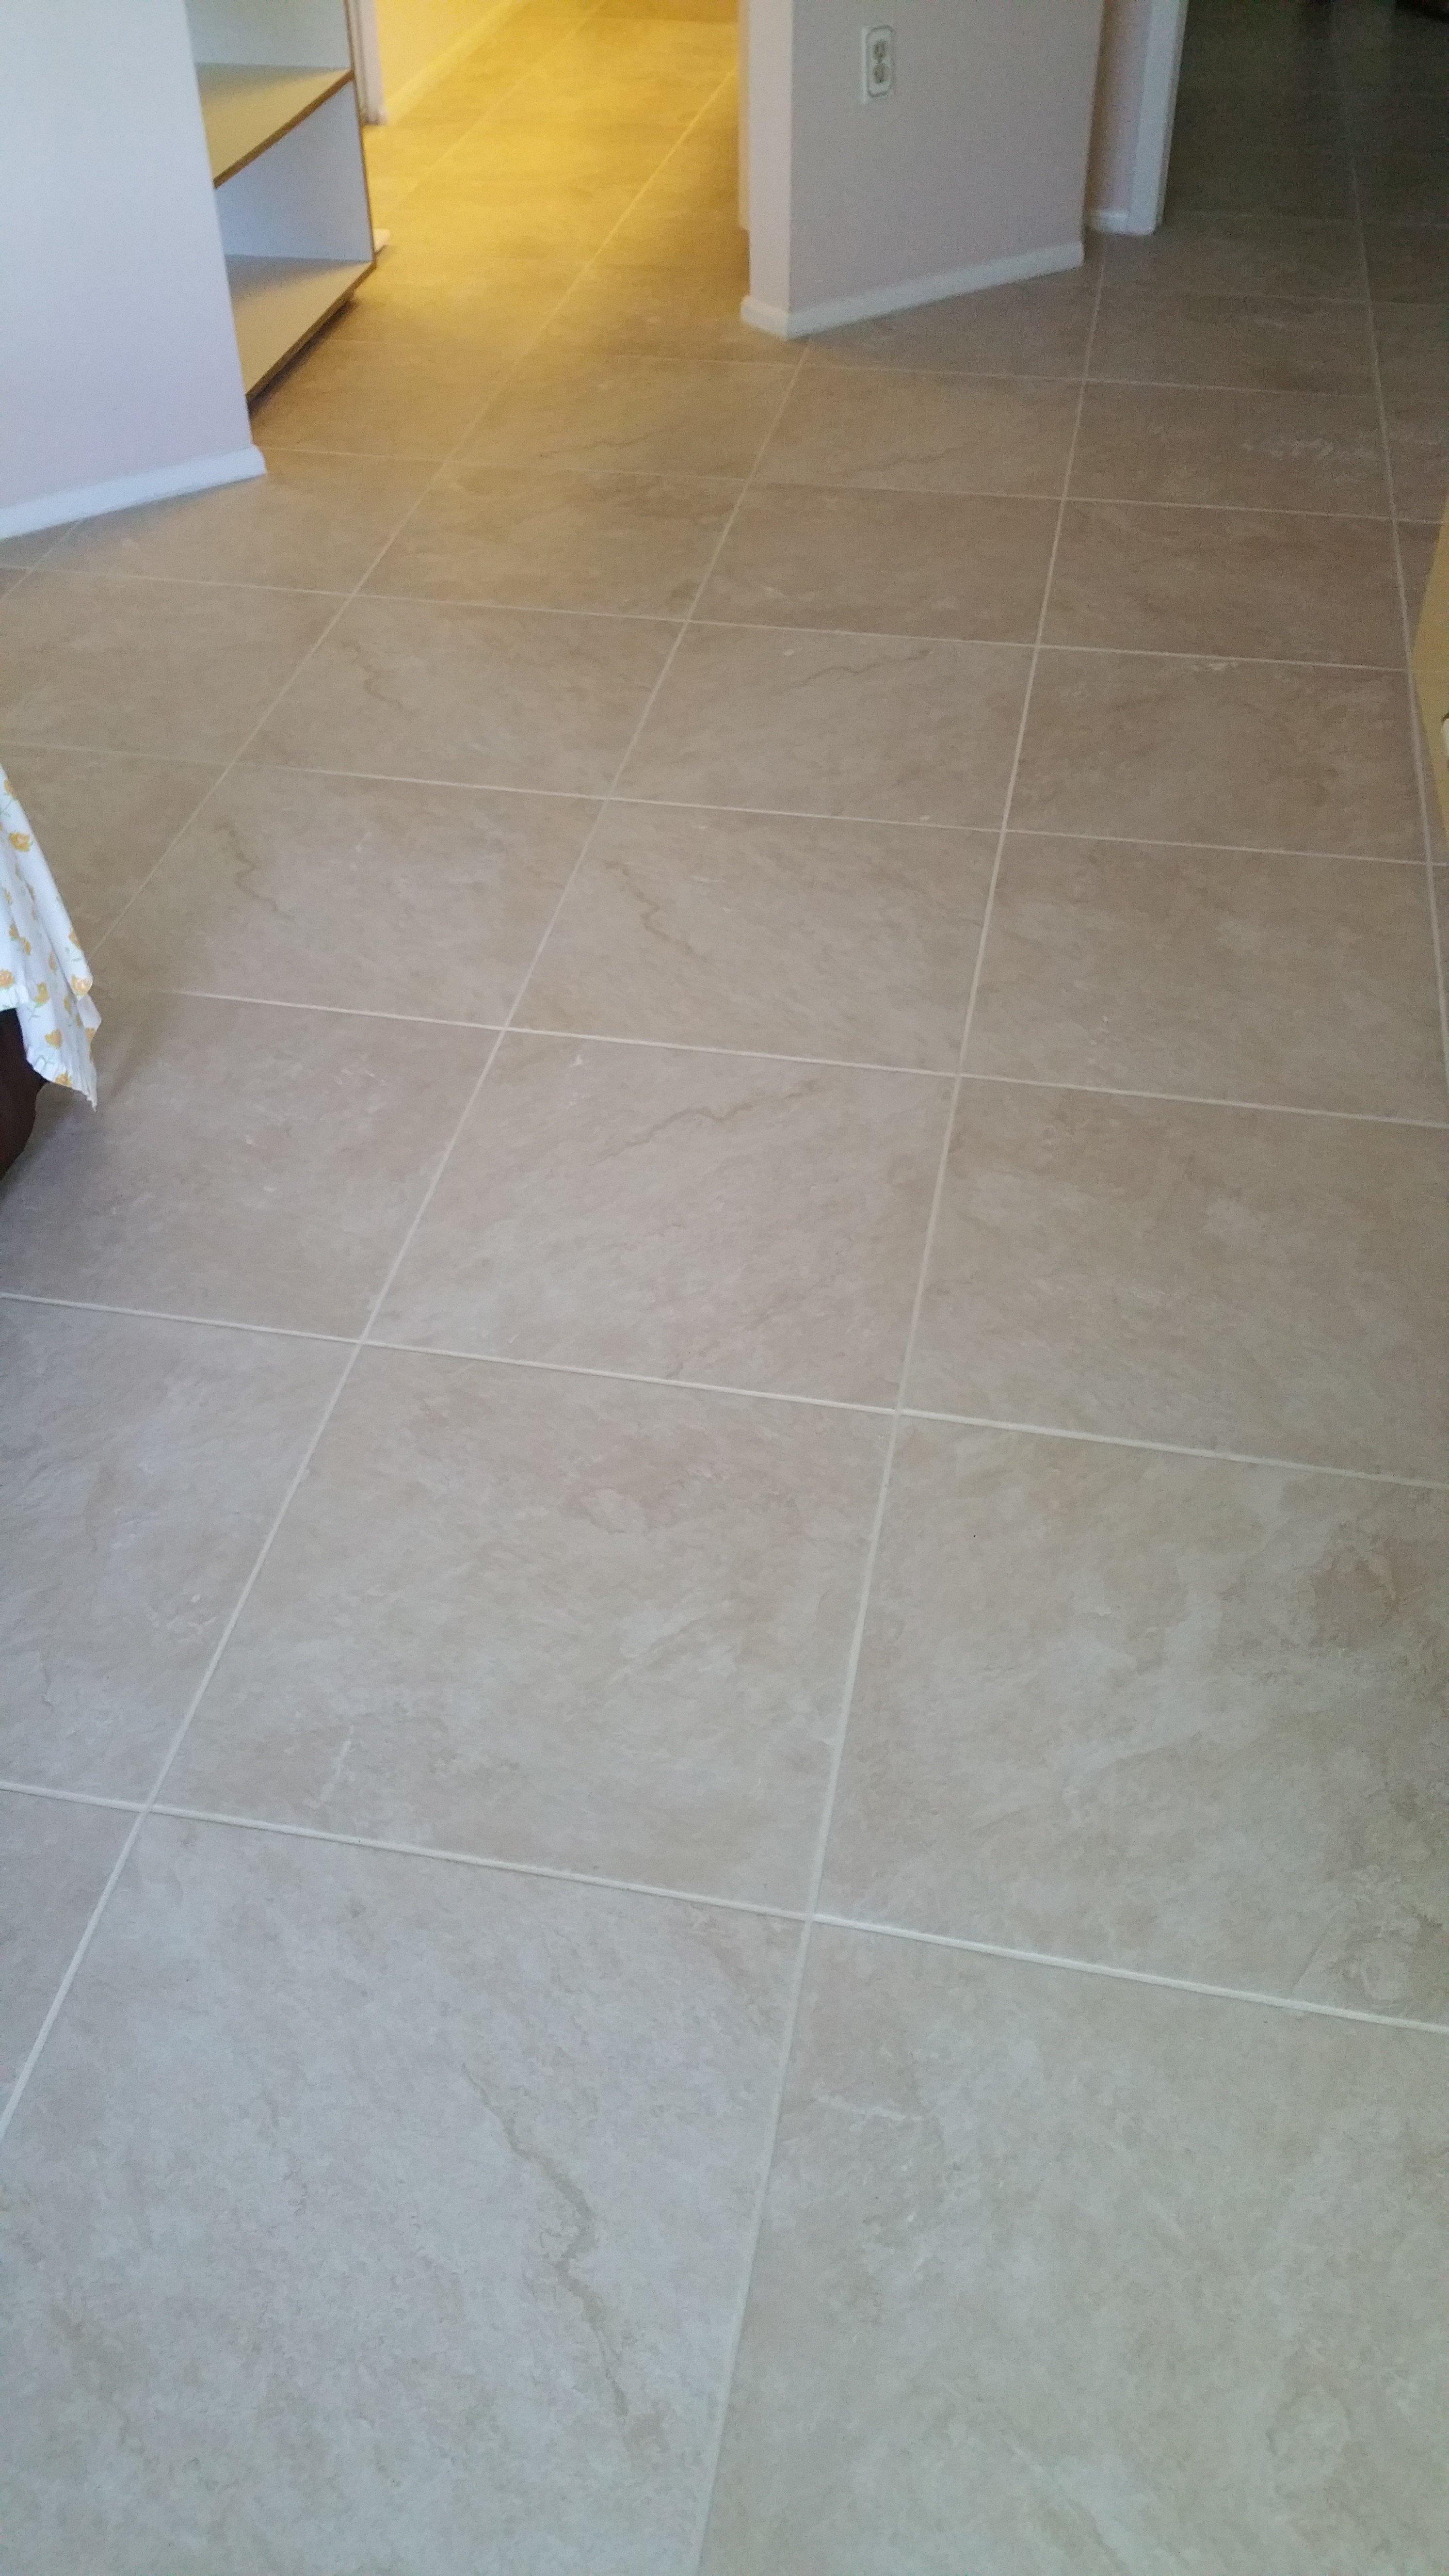 Tile flooring porcelain tiles sarasota fl pale tan square tiling dailygadgetfo Image collections